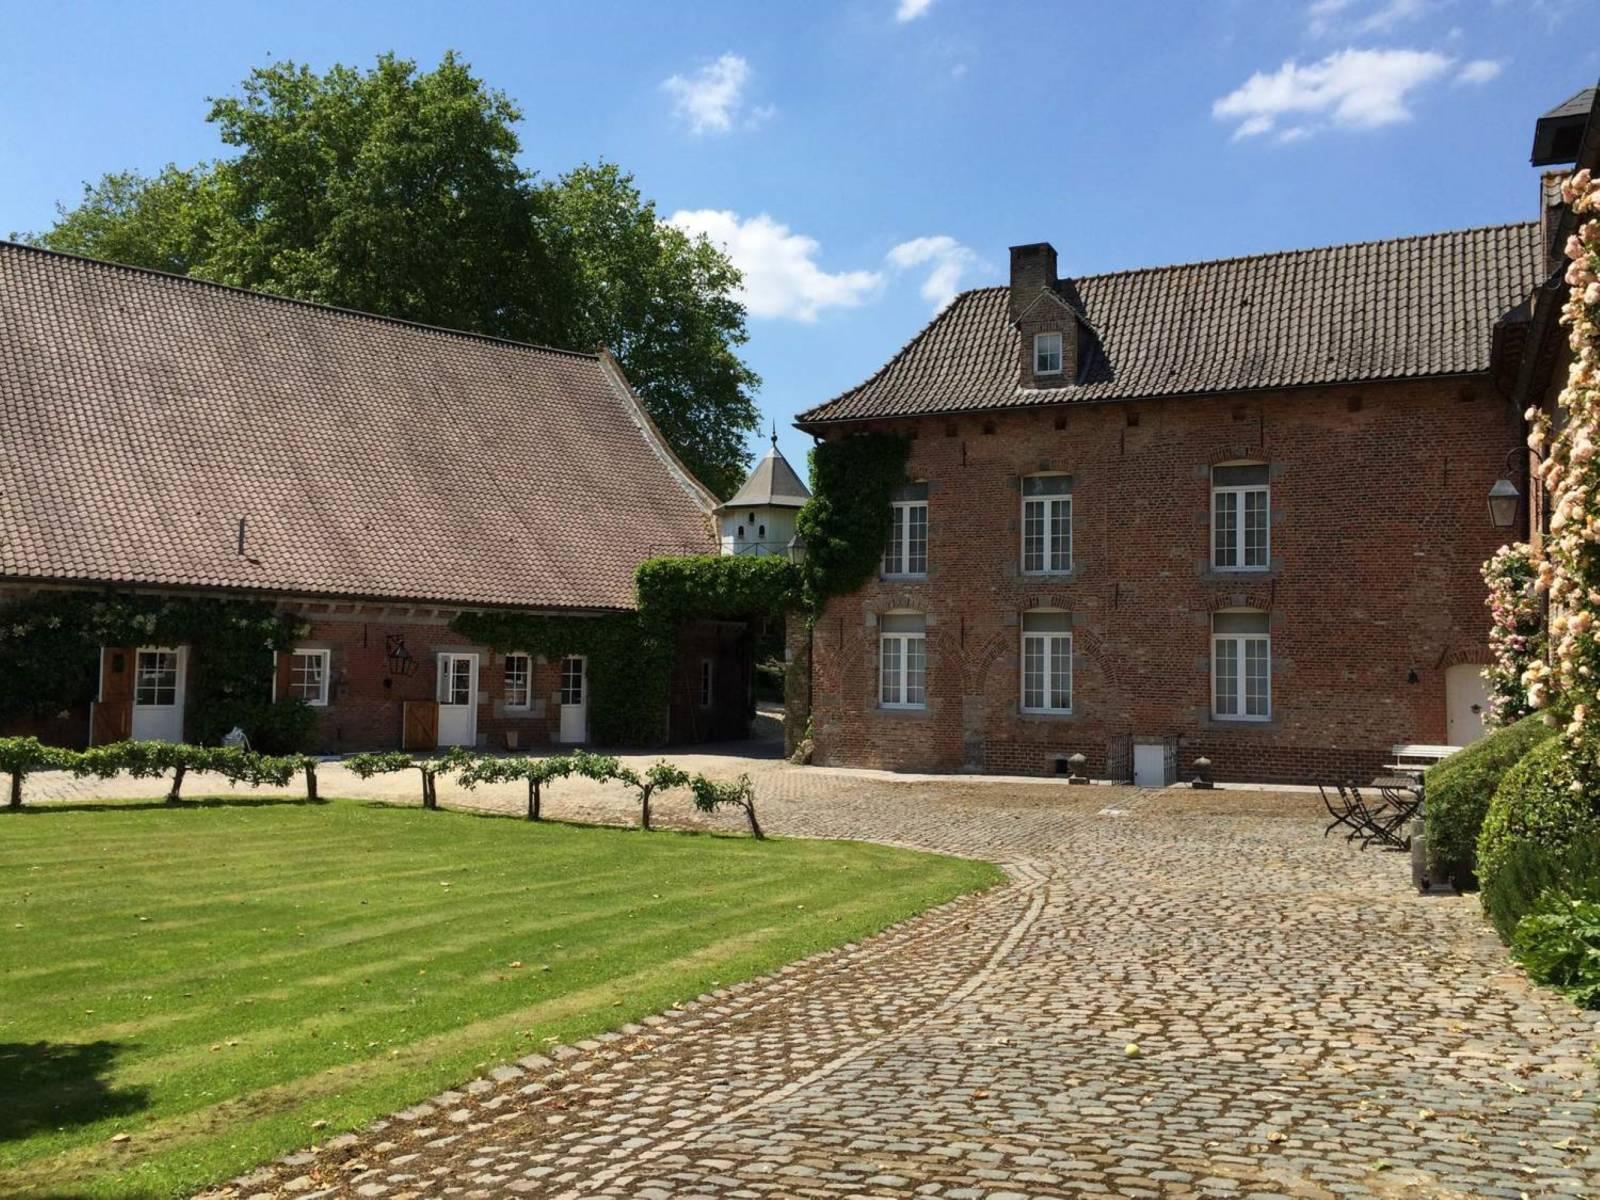 La ferme de Balingue House of Weddings feestzaal salle de fete lieu exceptionnel huwelijk mariage trouwen trouwzaal Brusse (31)